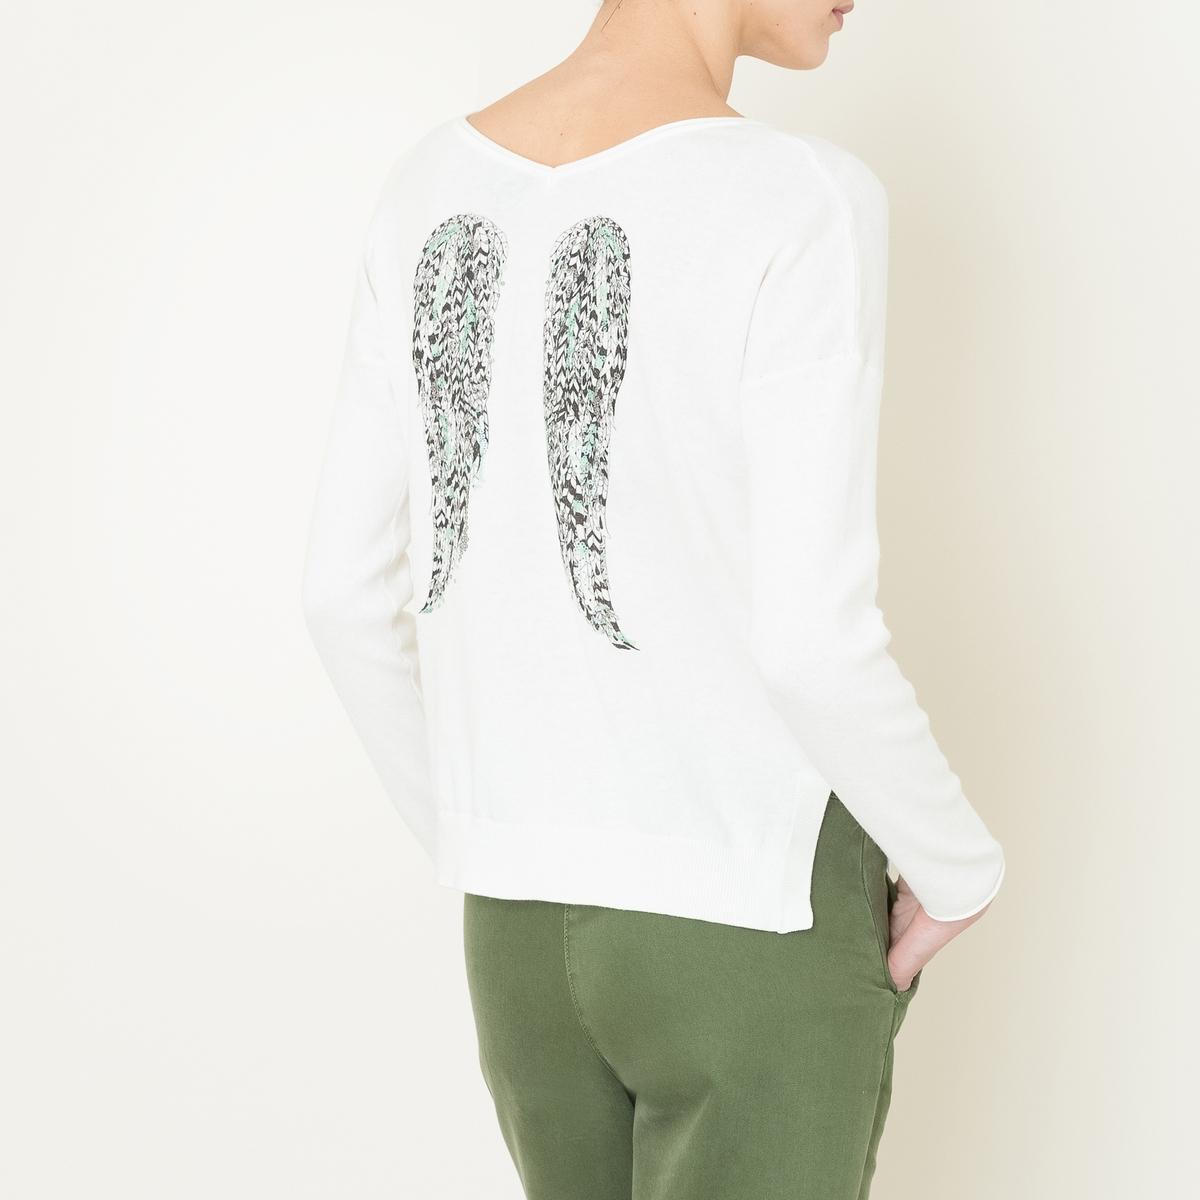 Пуловер YANIS myone пуловер из шелка и хлопка